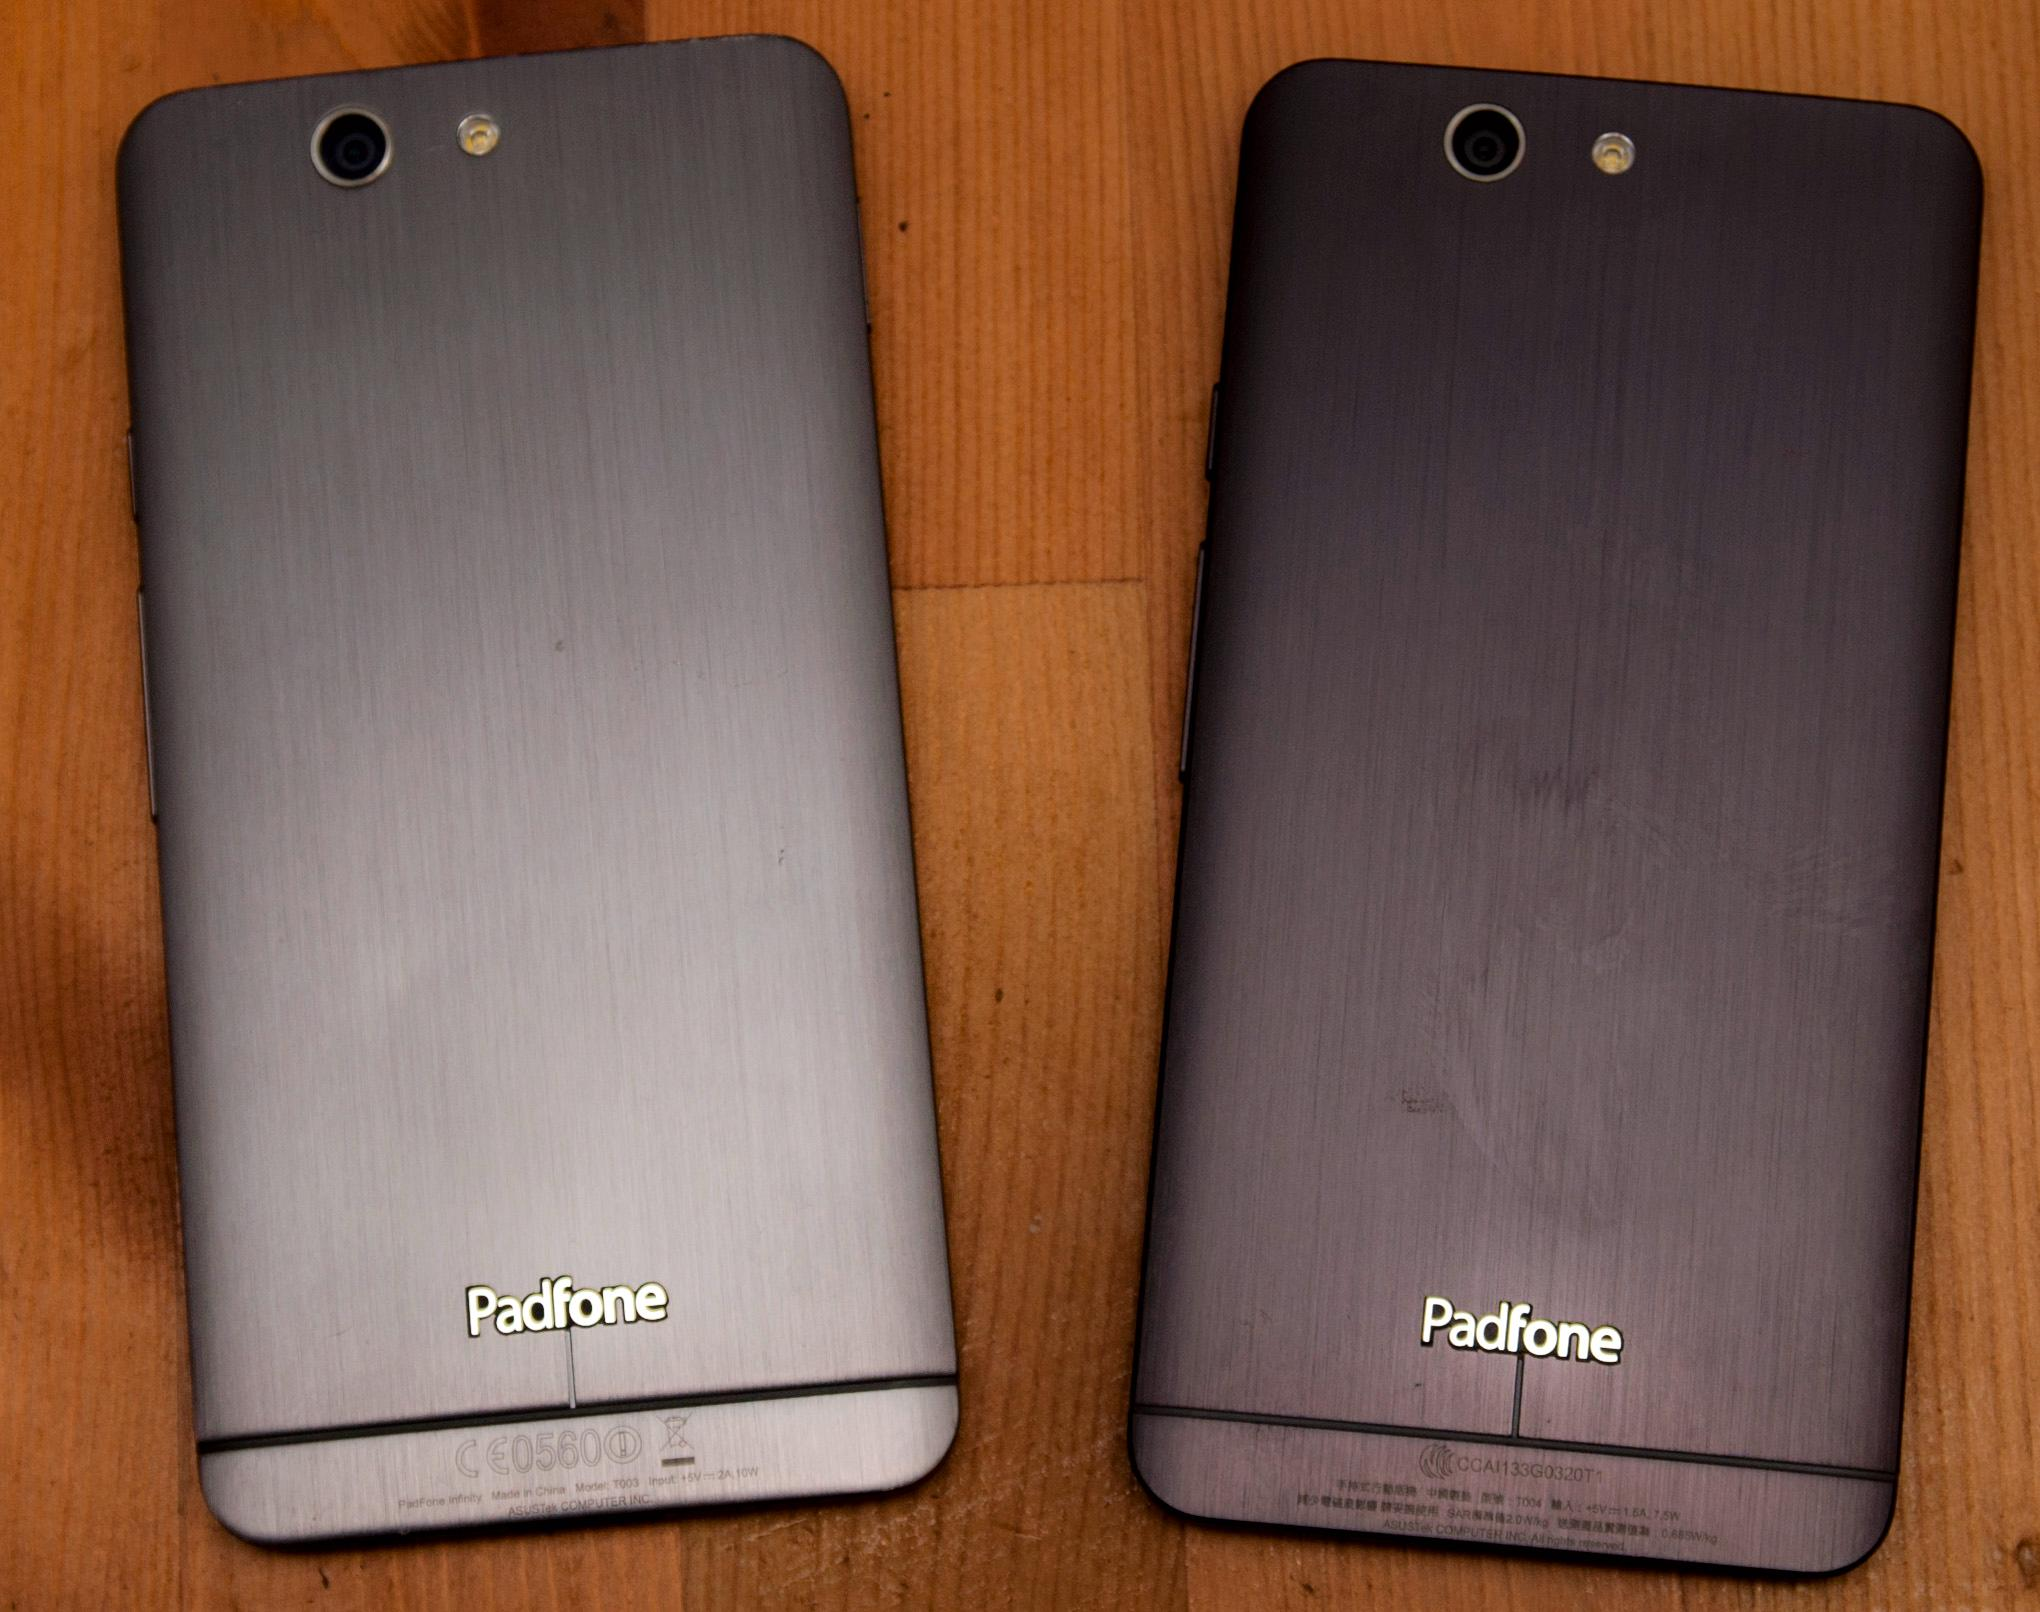 Ser du forskjellen? PadFone Infinity til venstre, og PadFone A86 til høyre.Foto: Finn Jarle Kvalheim, Amobil.no